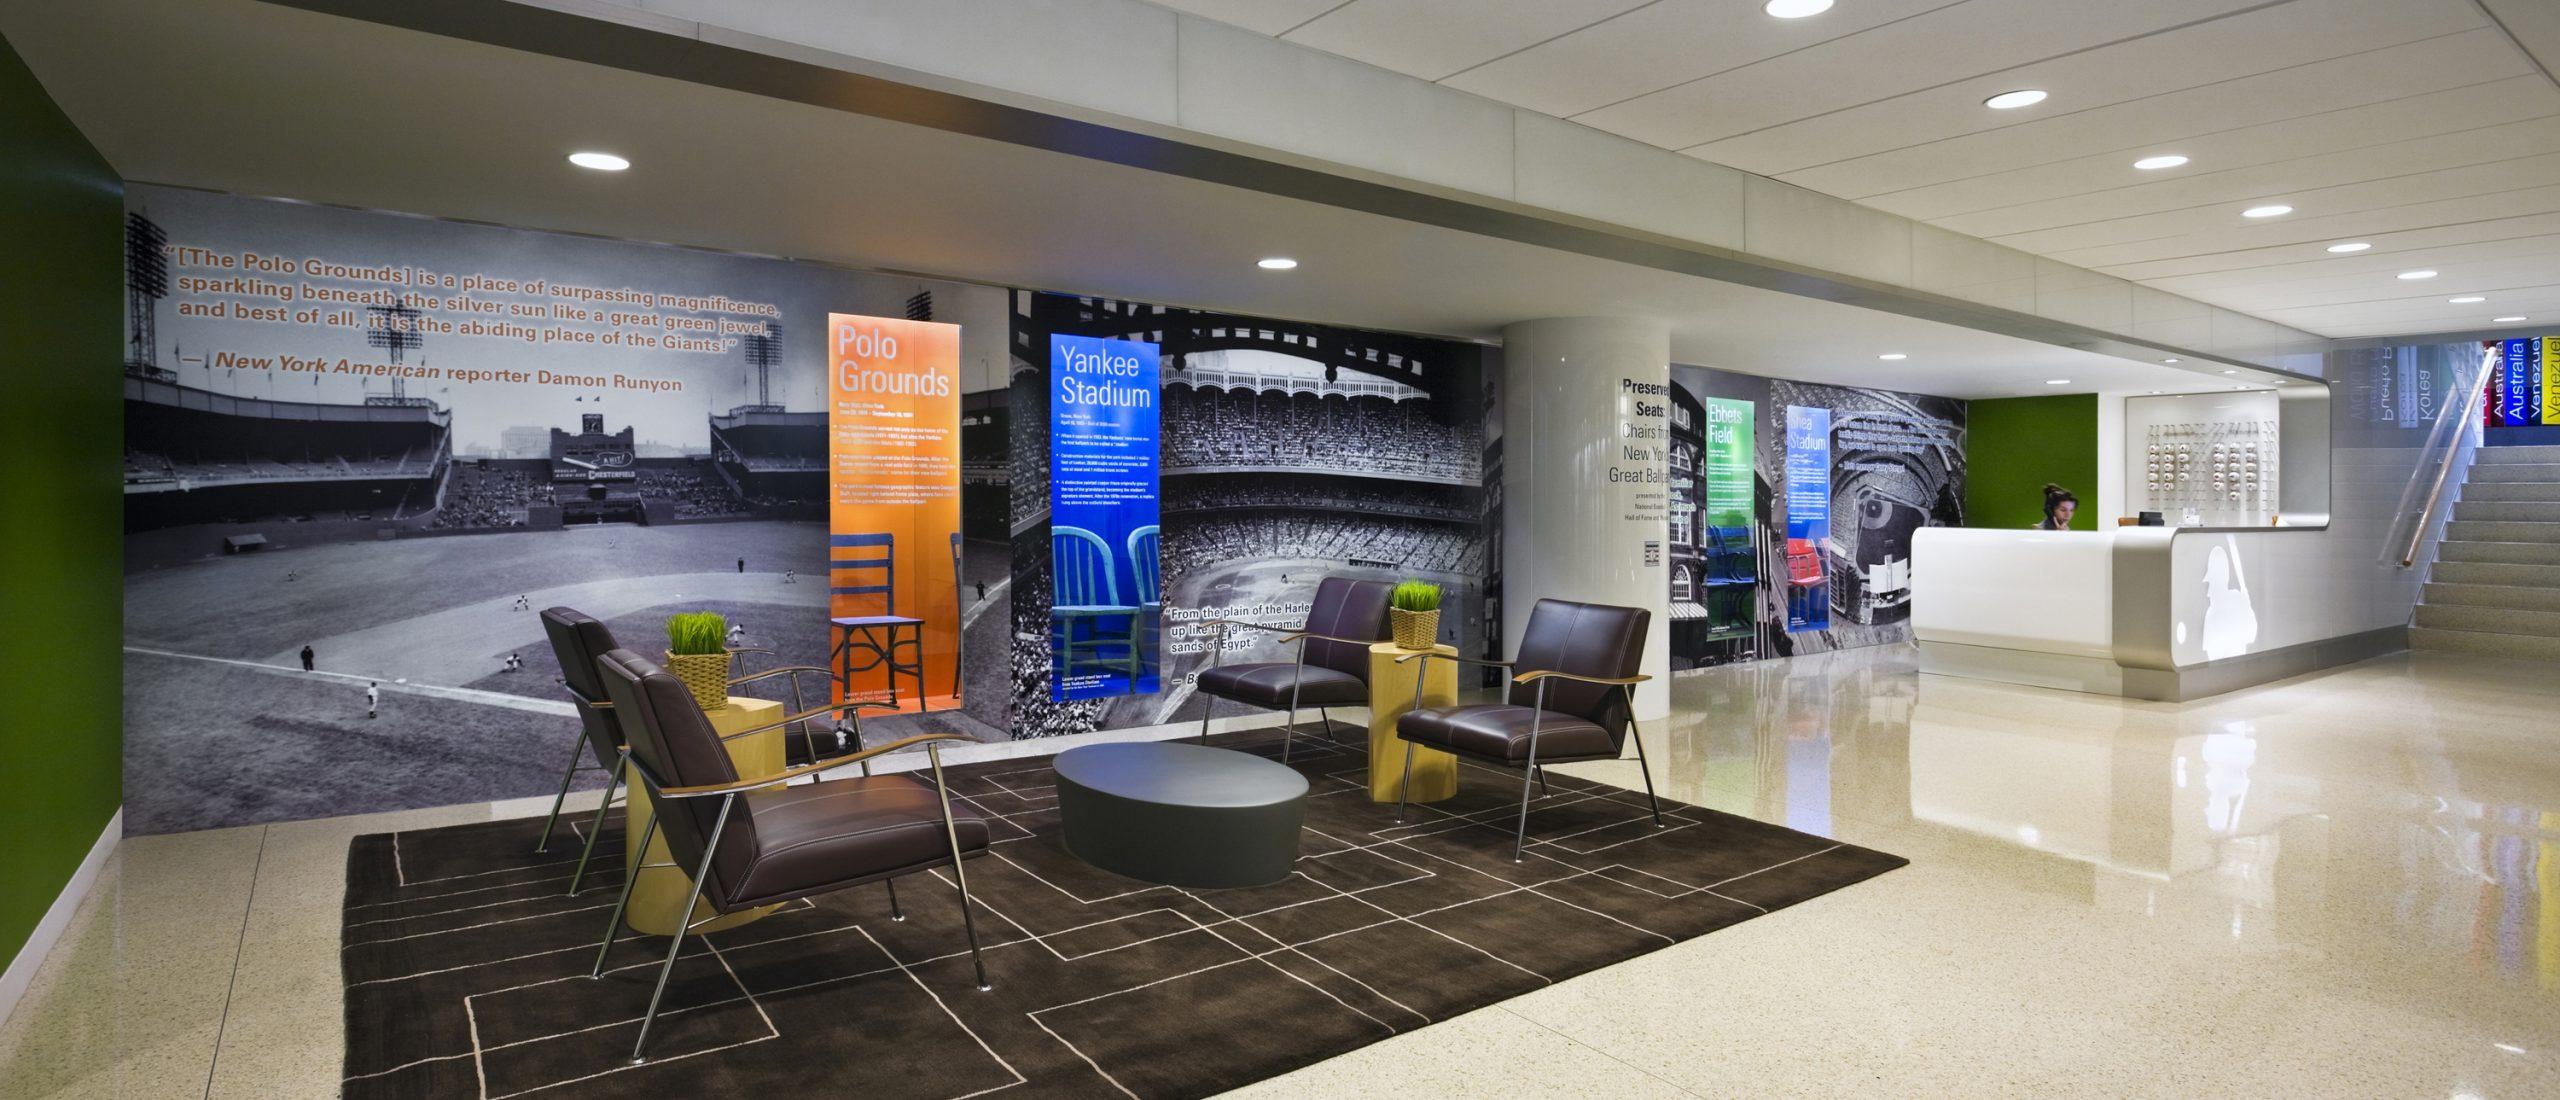 Project Image for Exhibits & Environments, Major League Baseball